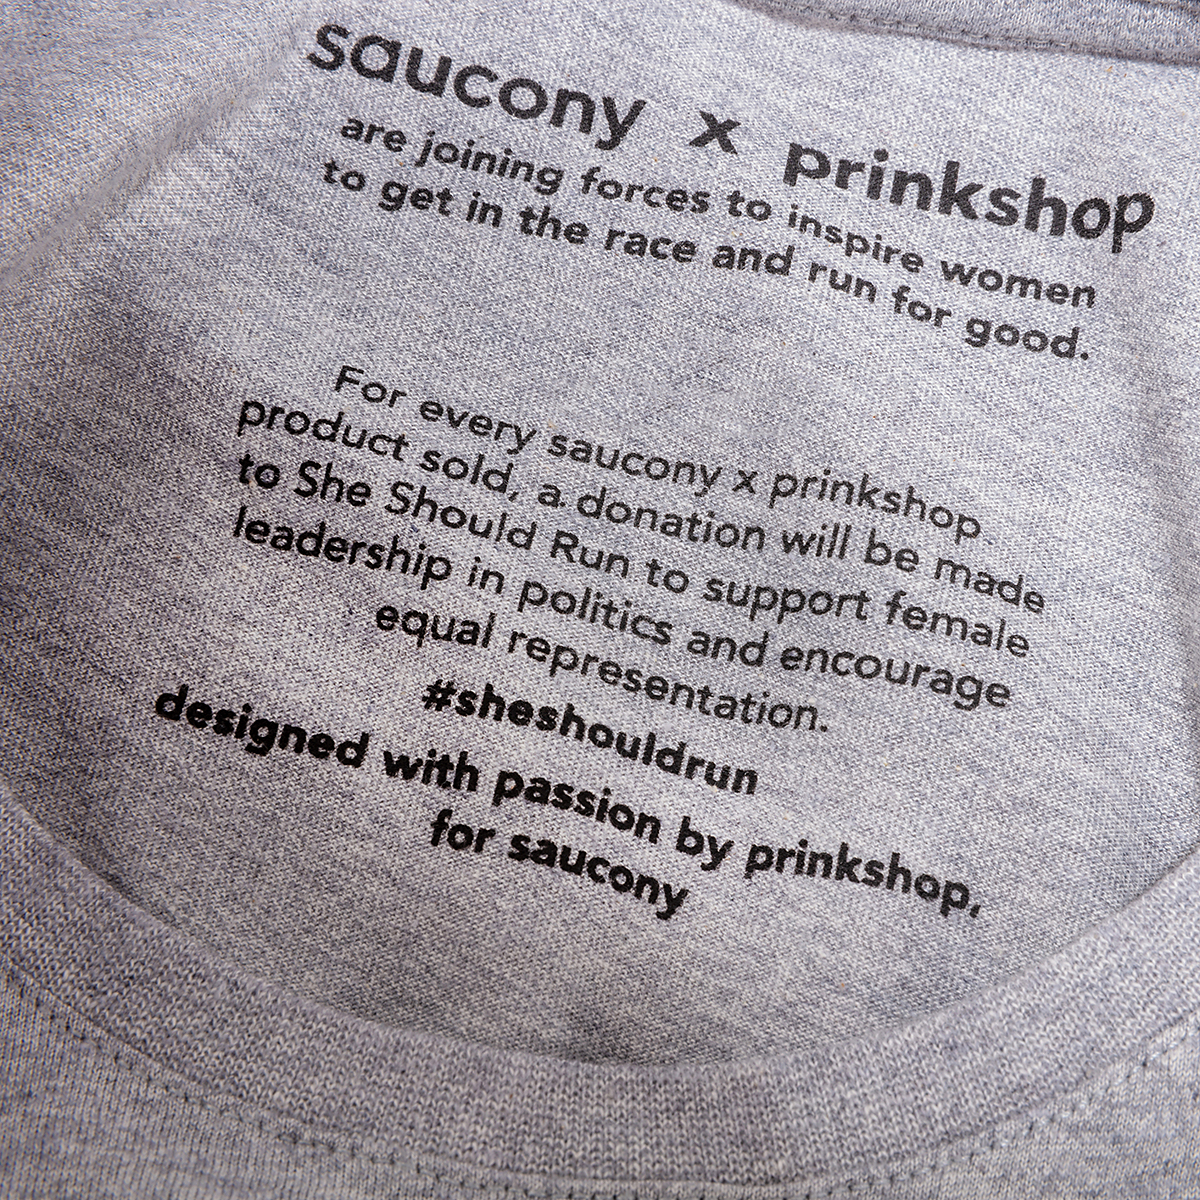 Men's Saucony x Prinkshop Hero T-Shirt  - Color: Light Grey Heather - Size: S, Light Grey Heather, large, image 2